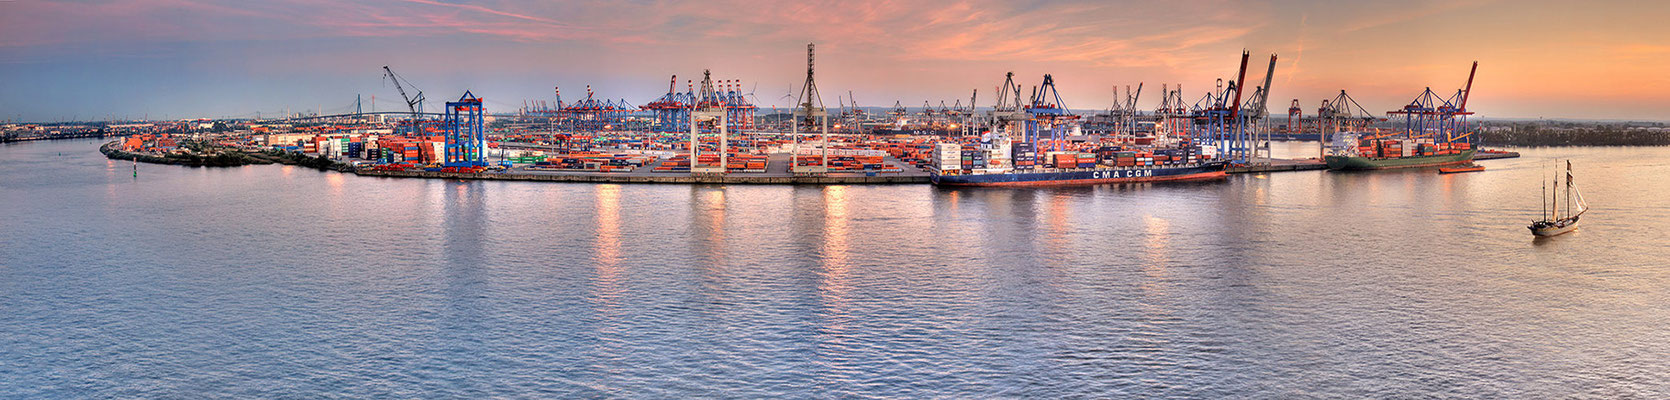 Containerterminal-Panorama · 170 x 40 cm · Leinwand auf Keilrahmen: € 460,- · Aludibond: € 660,- · Acrylglas auf Aludibond: € 1.020,-  · © Stefan Korff